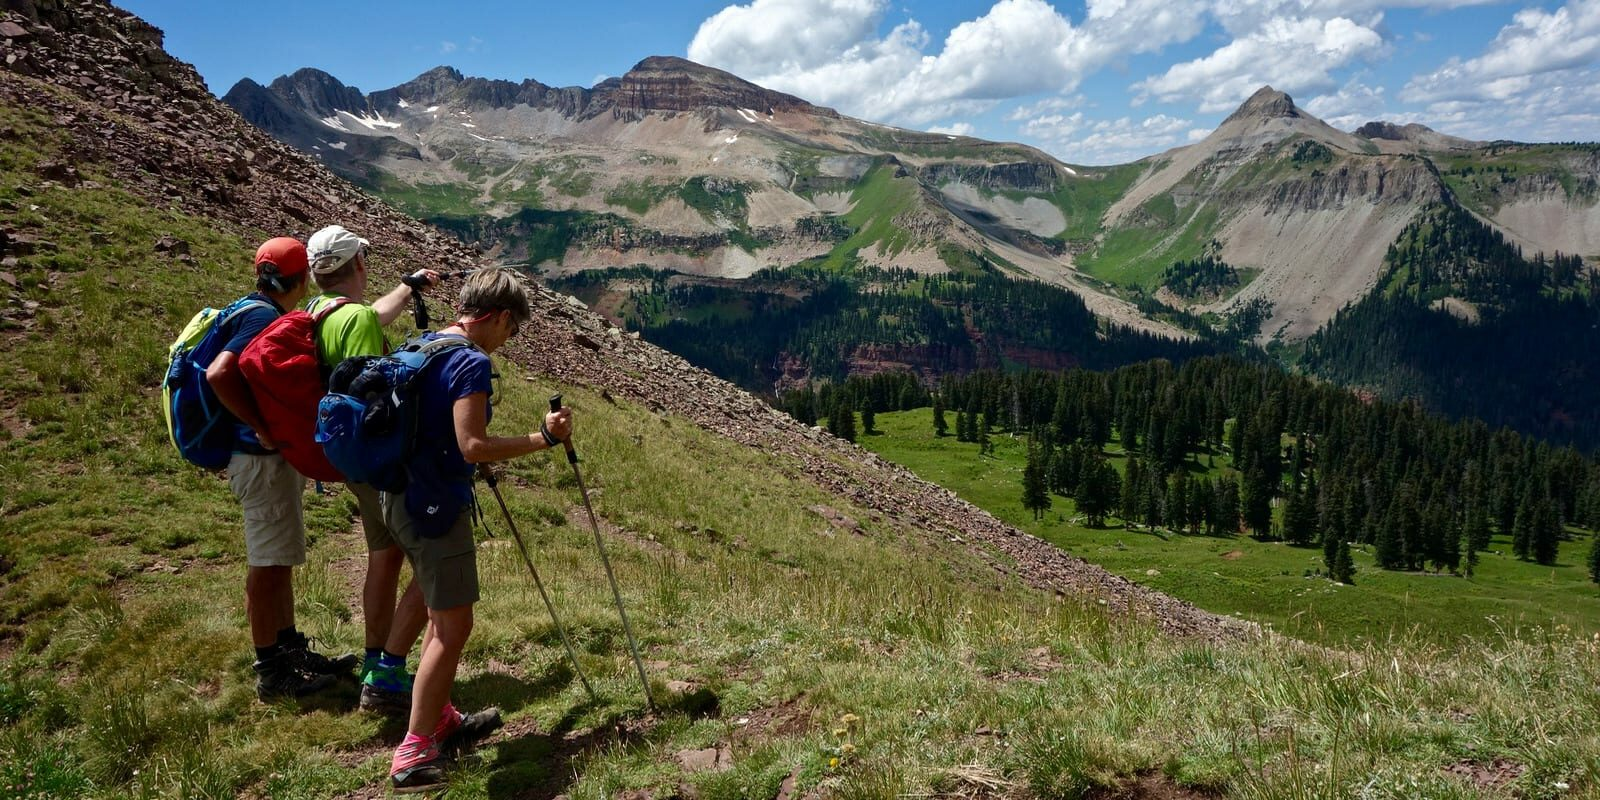 Highline Loop Trail Kennebac Pass to Shark's Tooth Durango Colorado